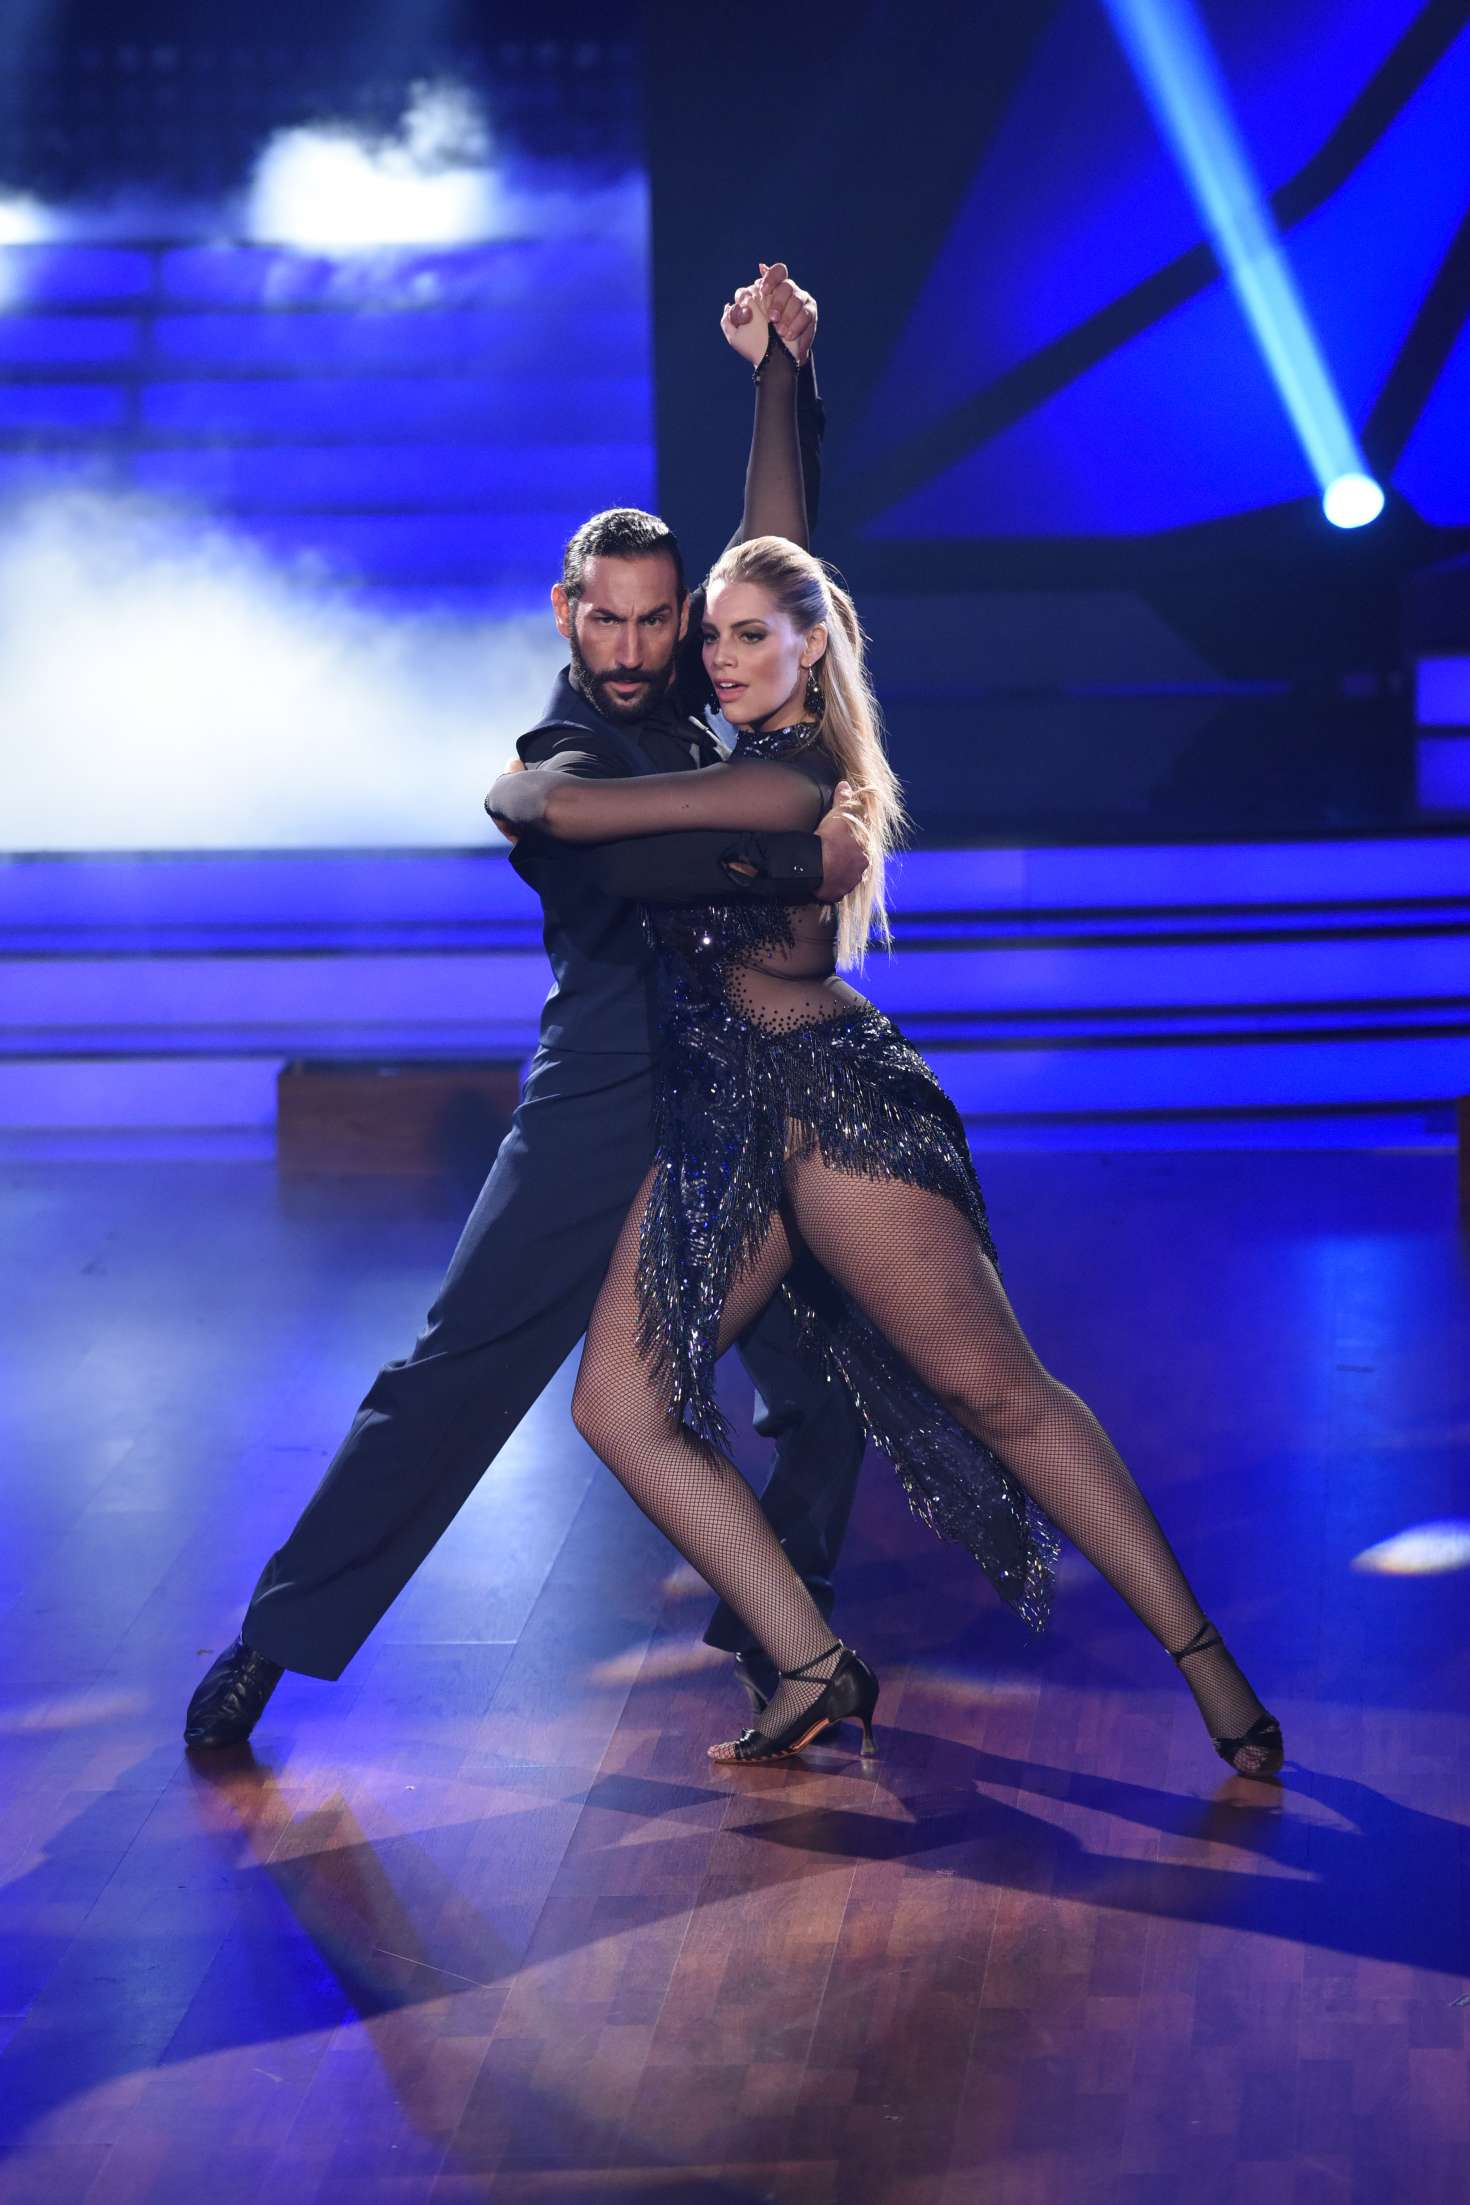 Ekaterina leonova lets dance rtl live tv show 01 gotceleb for Rtl spiegel tv live